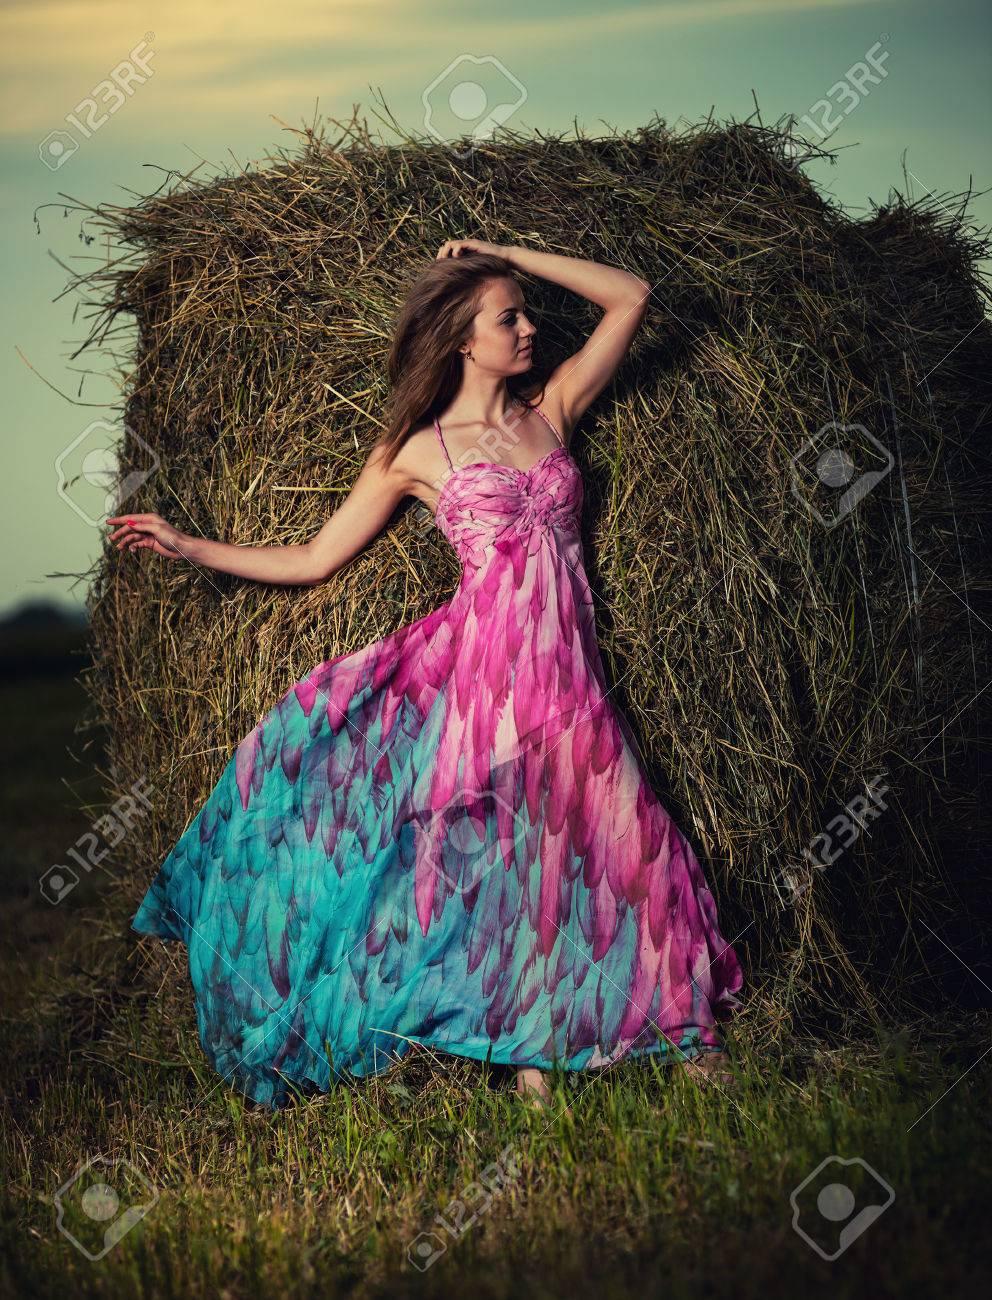 Секси девушка в поле